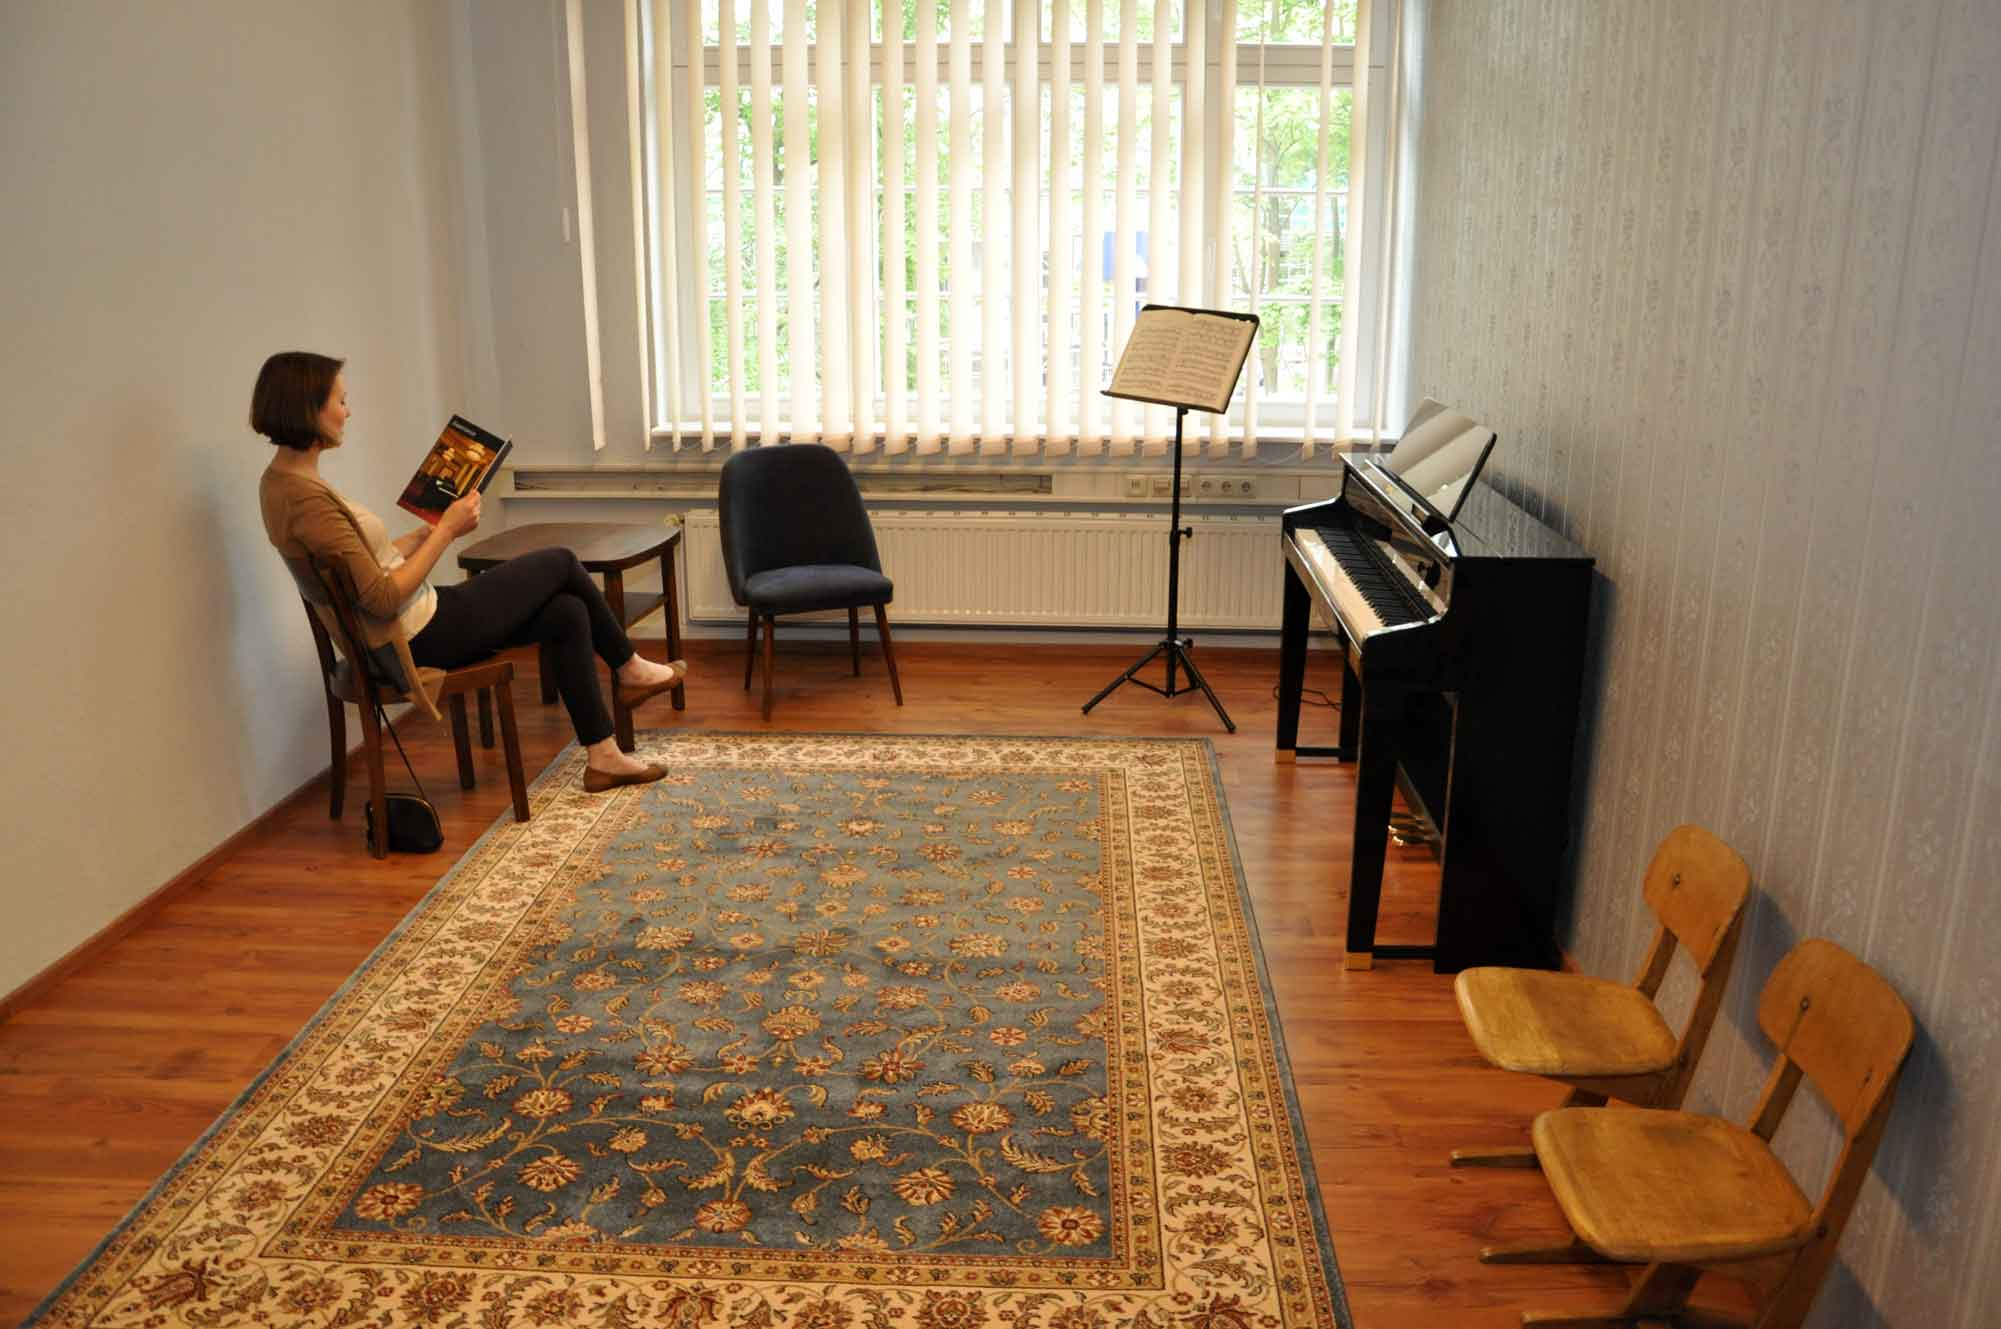 heimwerker renovieren tapeten selber tapezieren. Black Bedroom Furniture Sets. Home Design Ideas